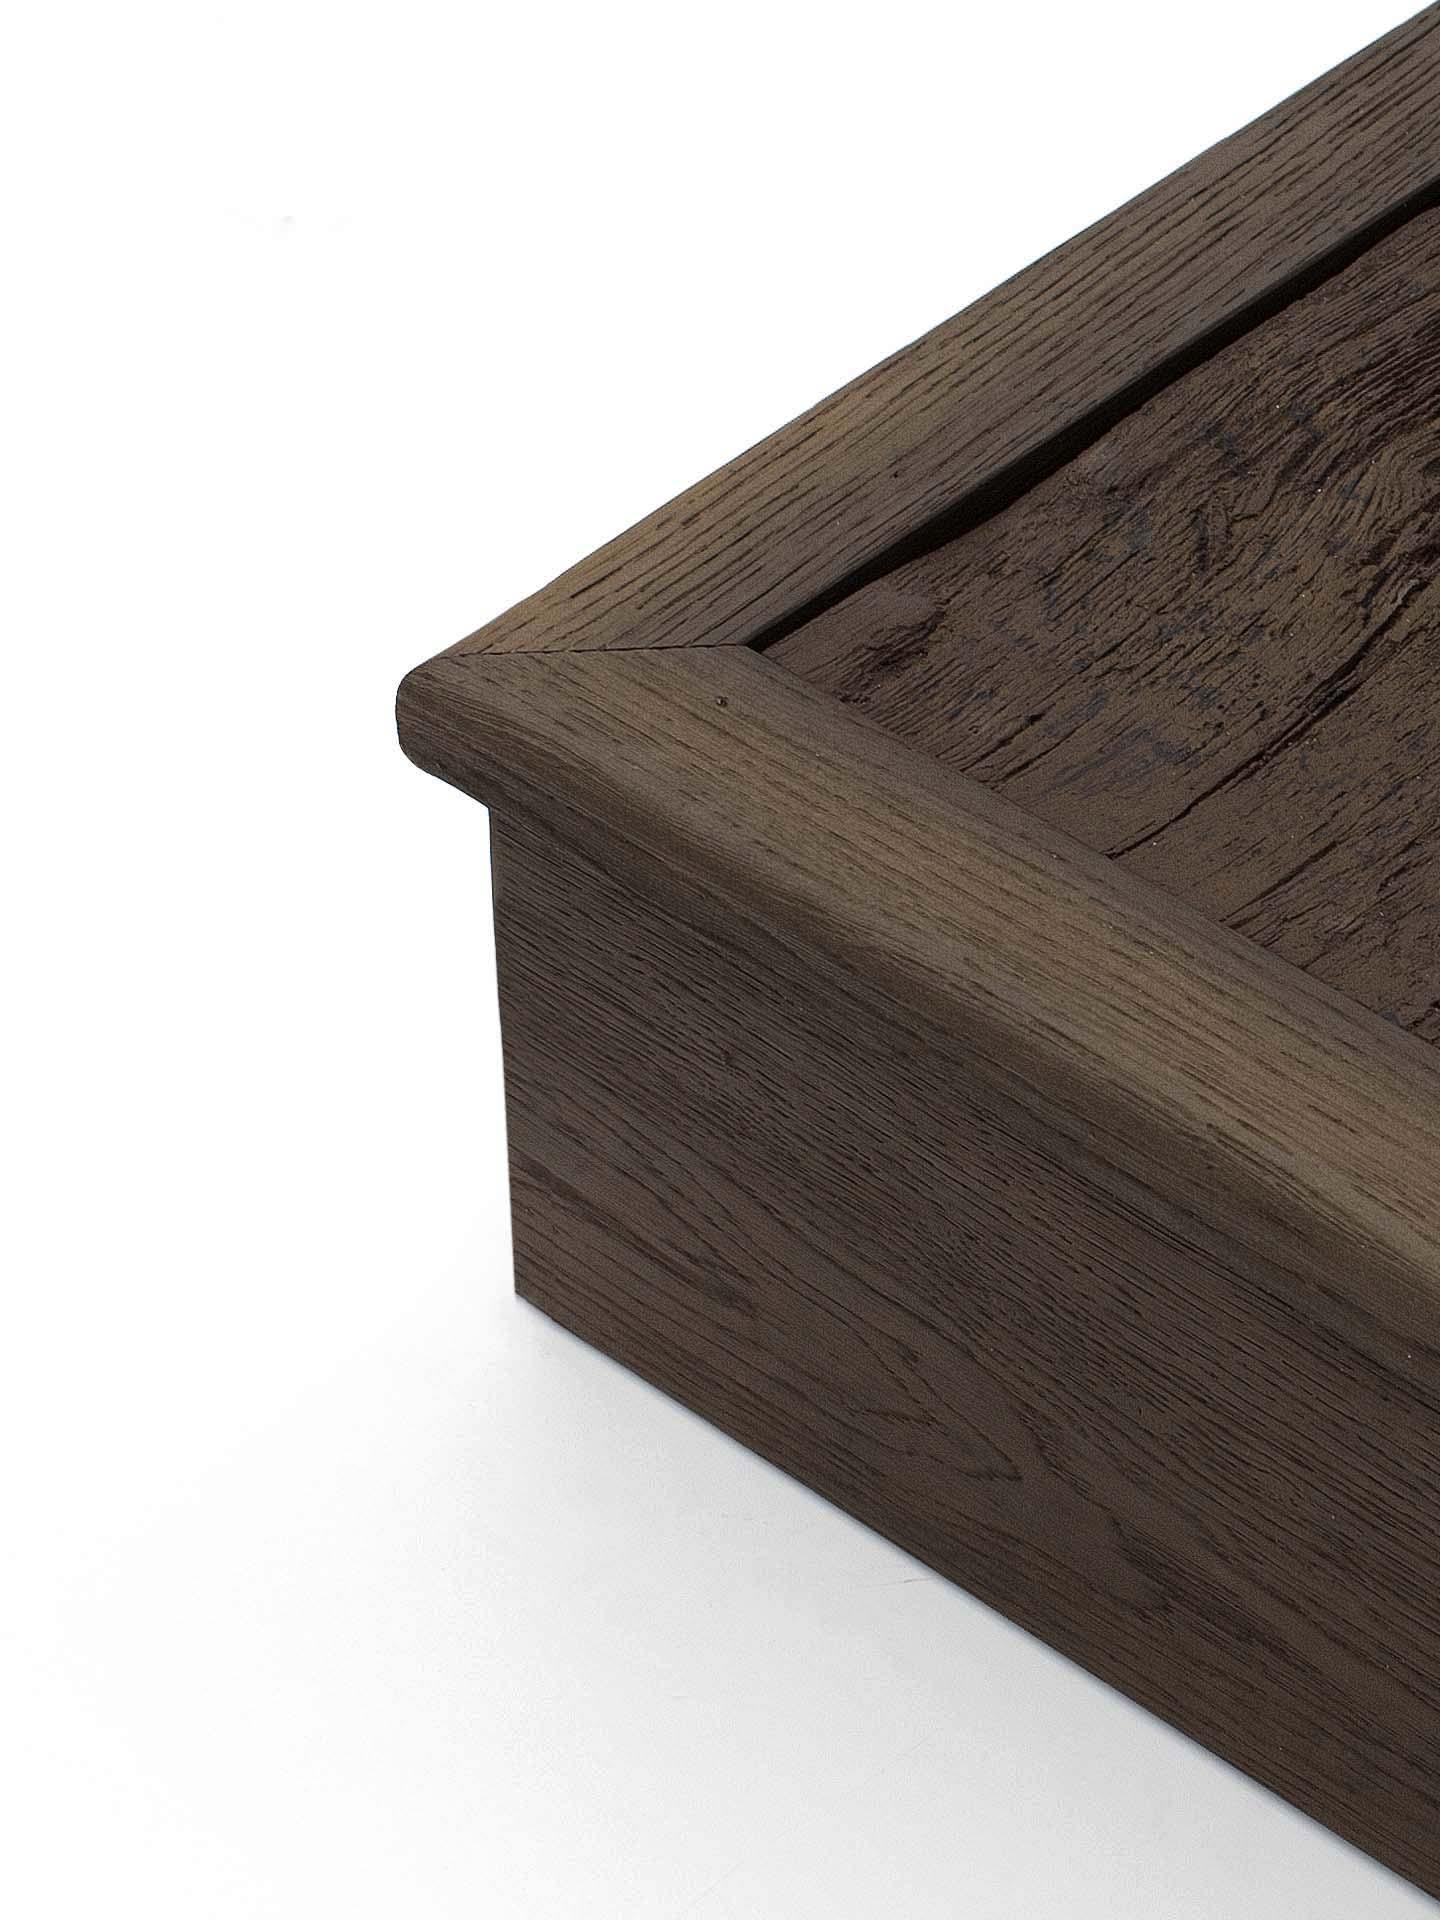 ArrondiRondRound - 50 x 3200 x 33 mm2,67 kg / planche50 x 3200 x 33 mm2,67 kg/plank50 x 3200 x 33 mm2.67 kg / board